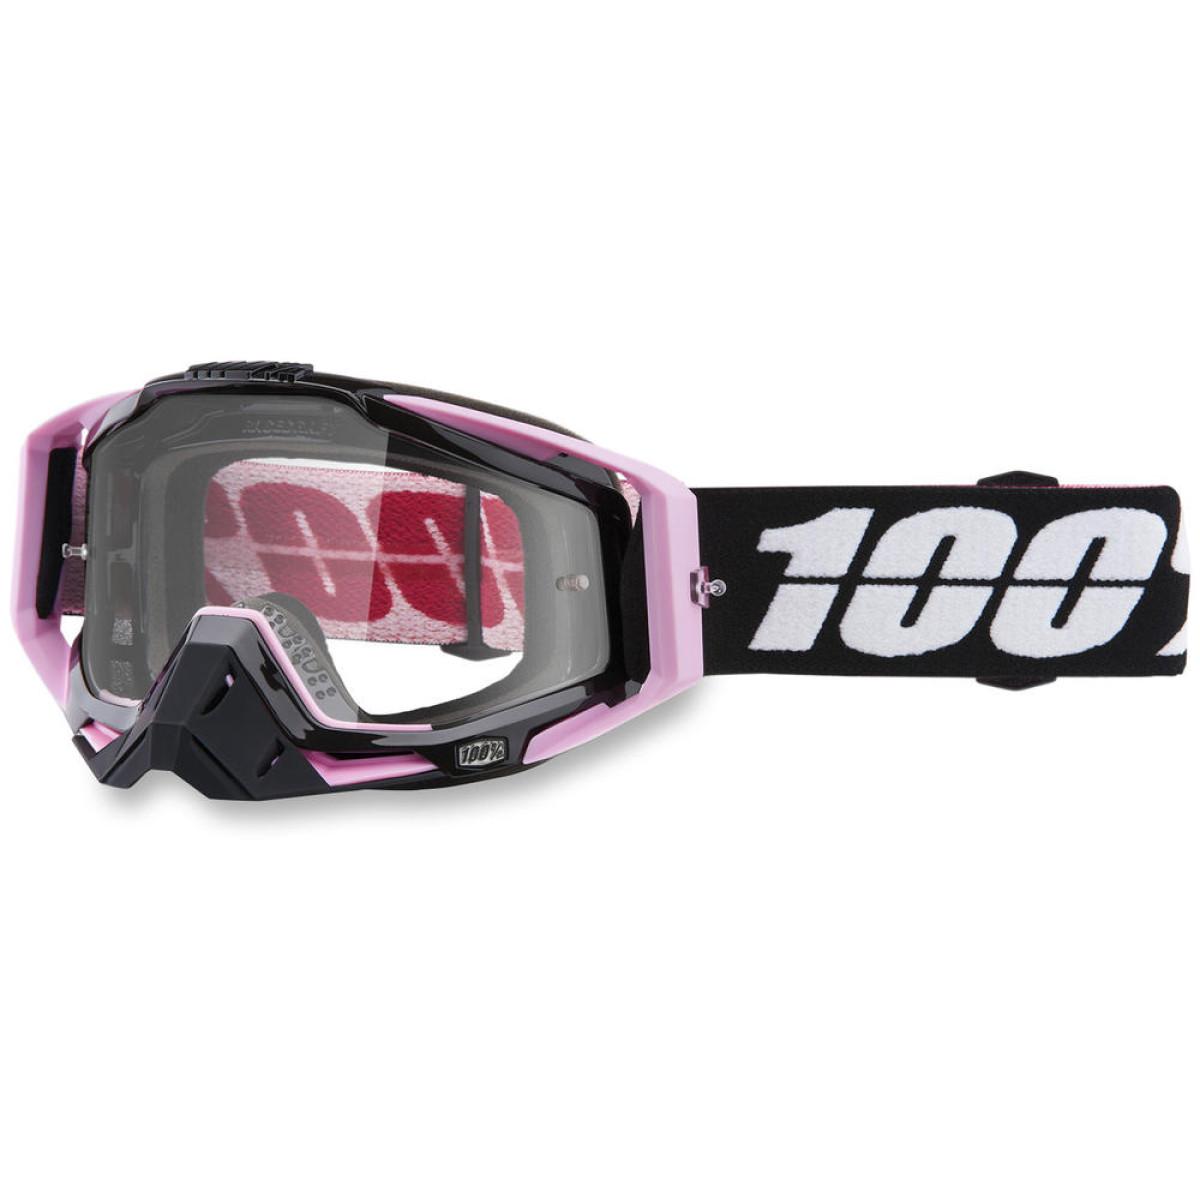 100% Crossbrille The Racecraft Floyd - Klar